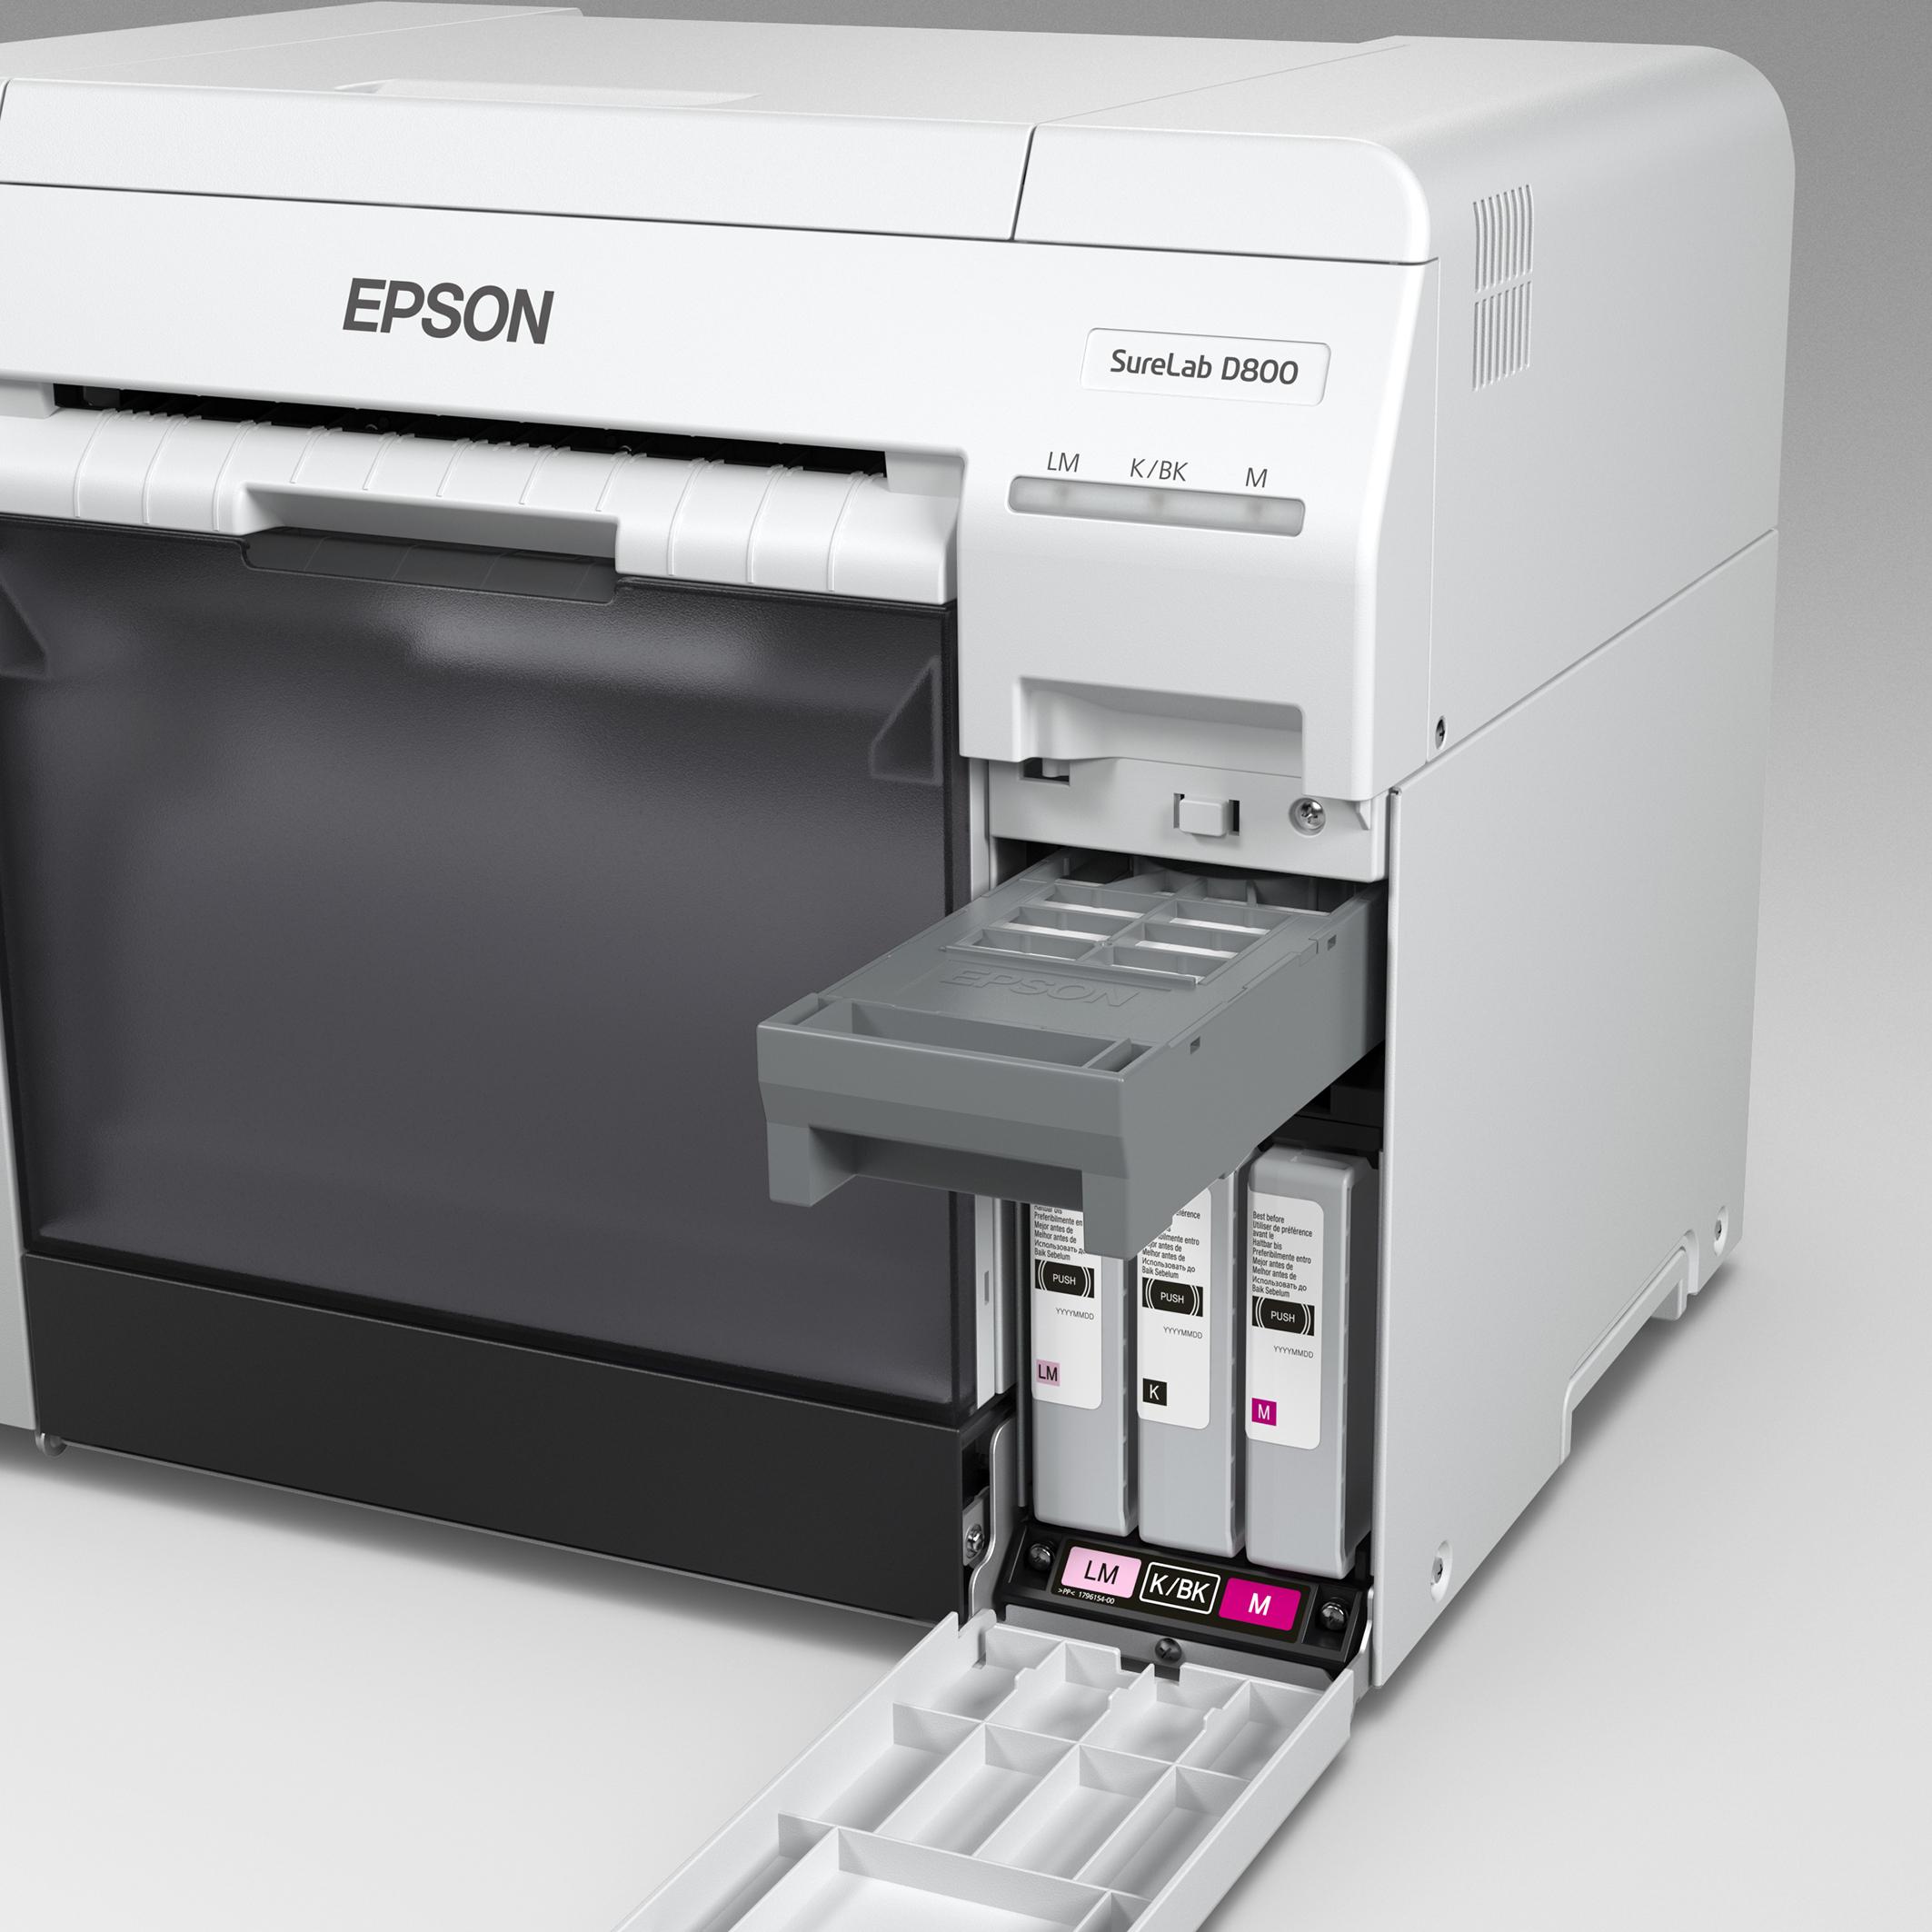 epson-surelab-sl-d800-tinten-1-mid.jpg